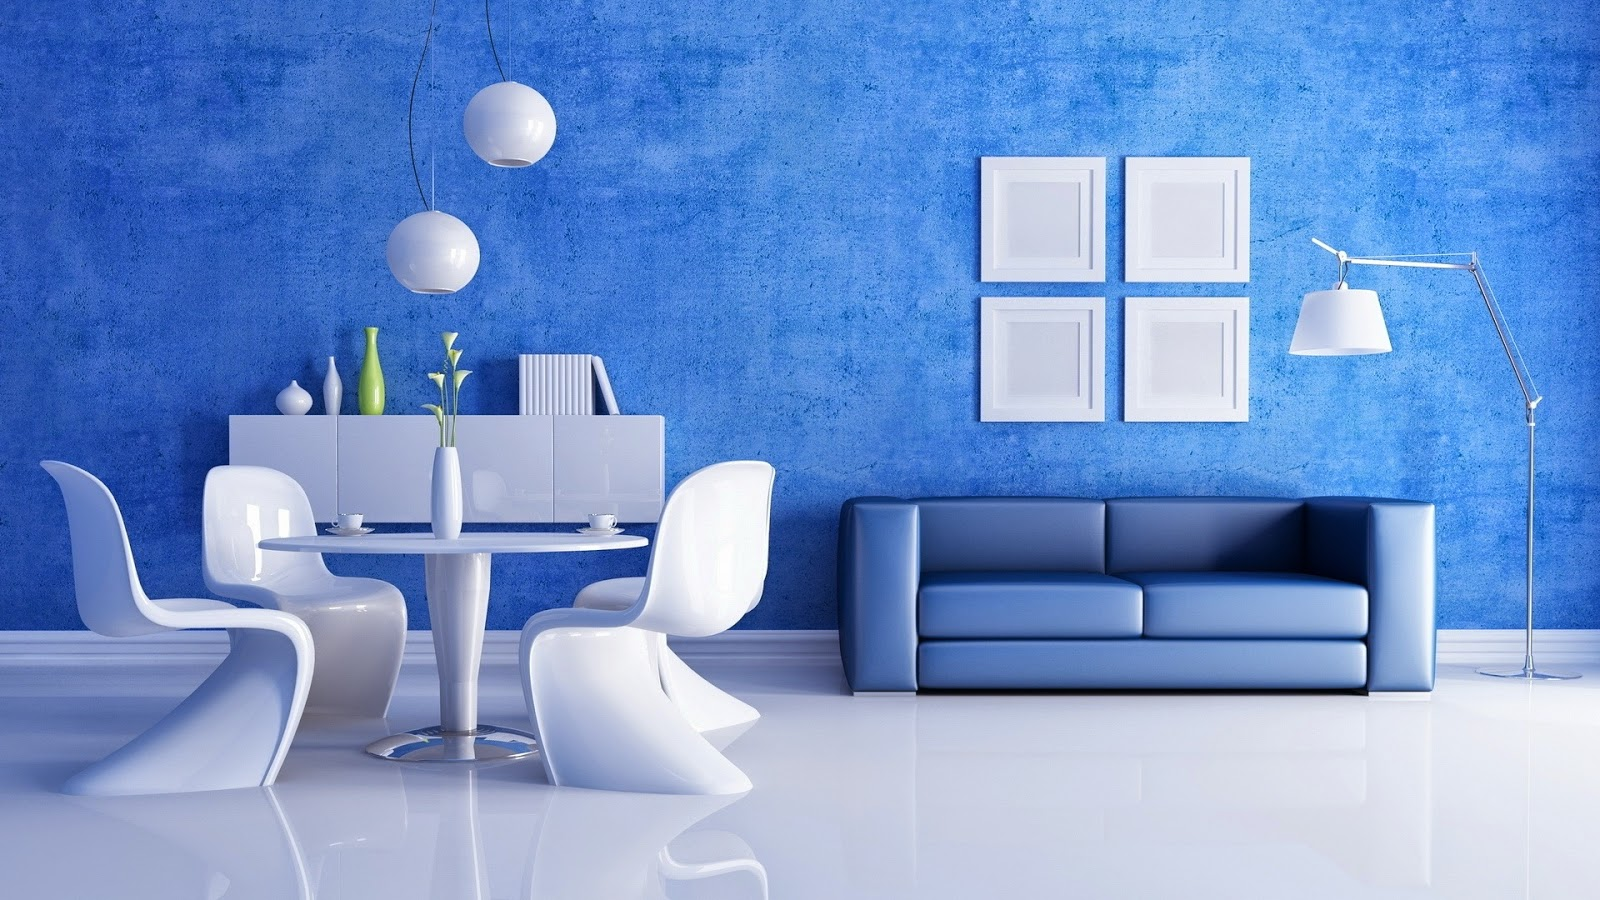 matlfesh 2015. Black Bedroom Furniture Sets. Home Design Ideas